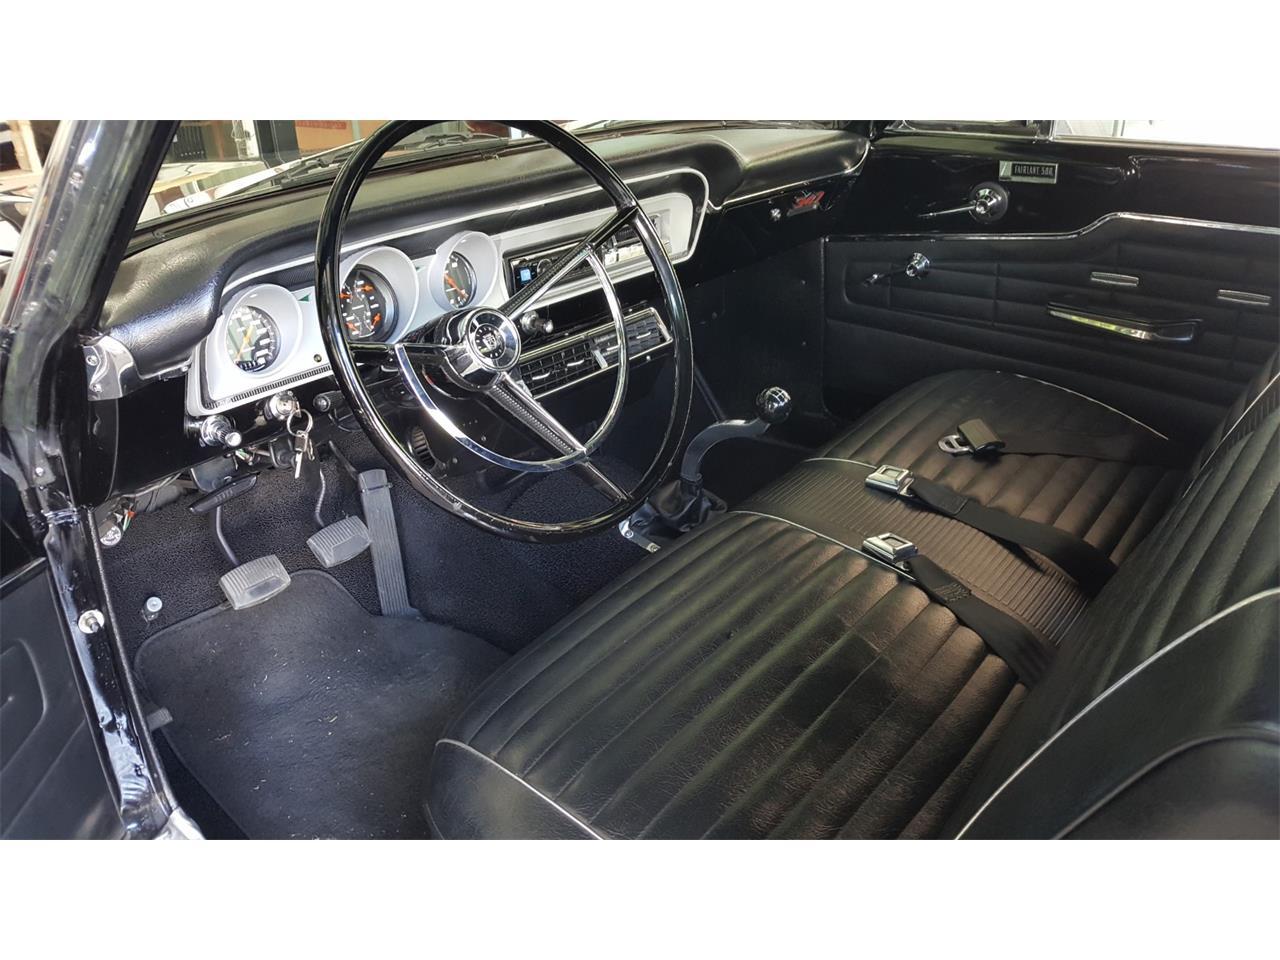 1964 Ford Fairlane 500 (CC-1356567) for sale in San Antonio, Texas